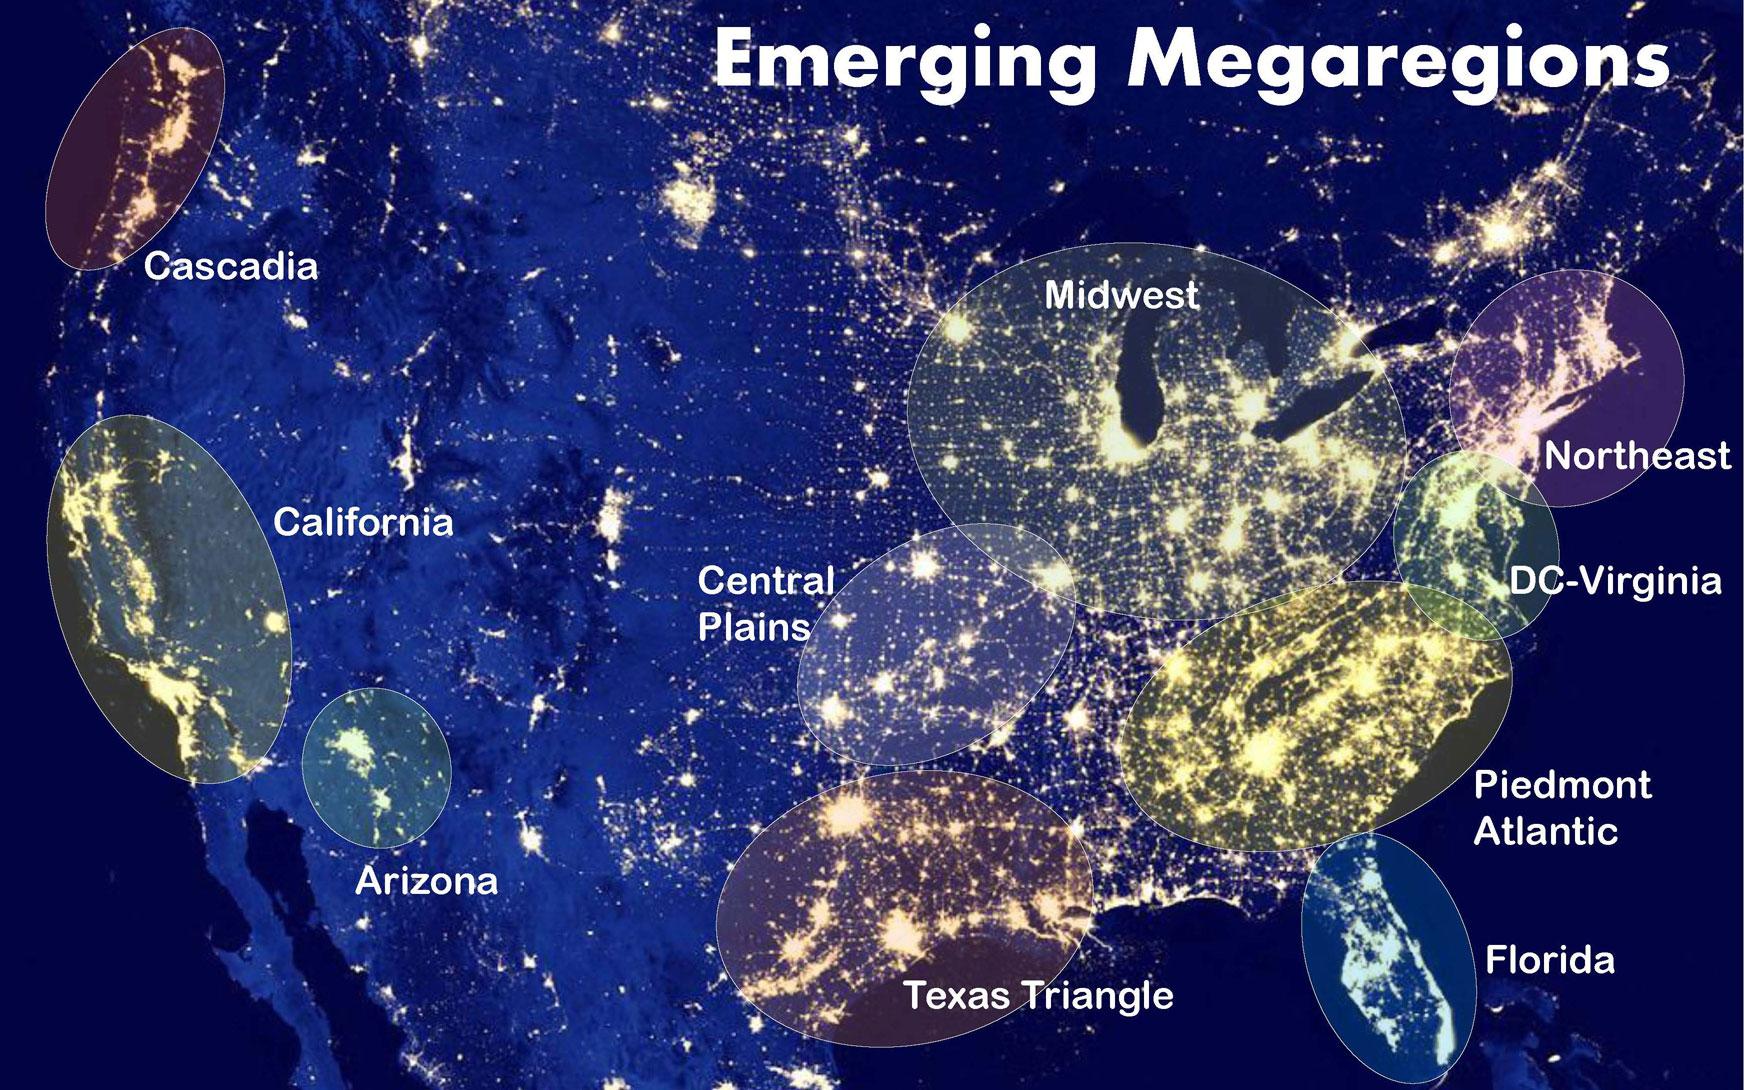 High Resolution Map Megaregions Planning FHWA - Us megaregions map